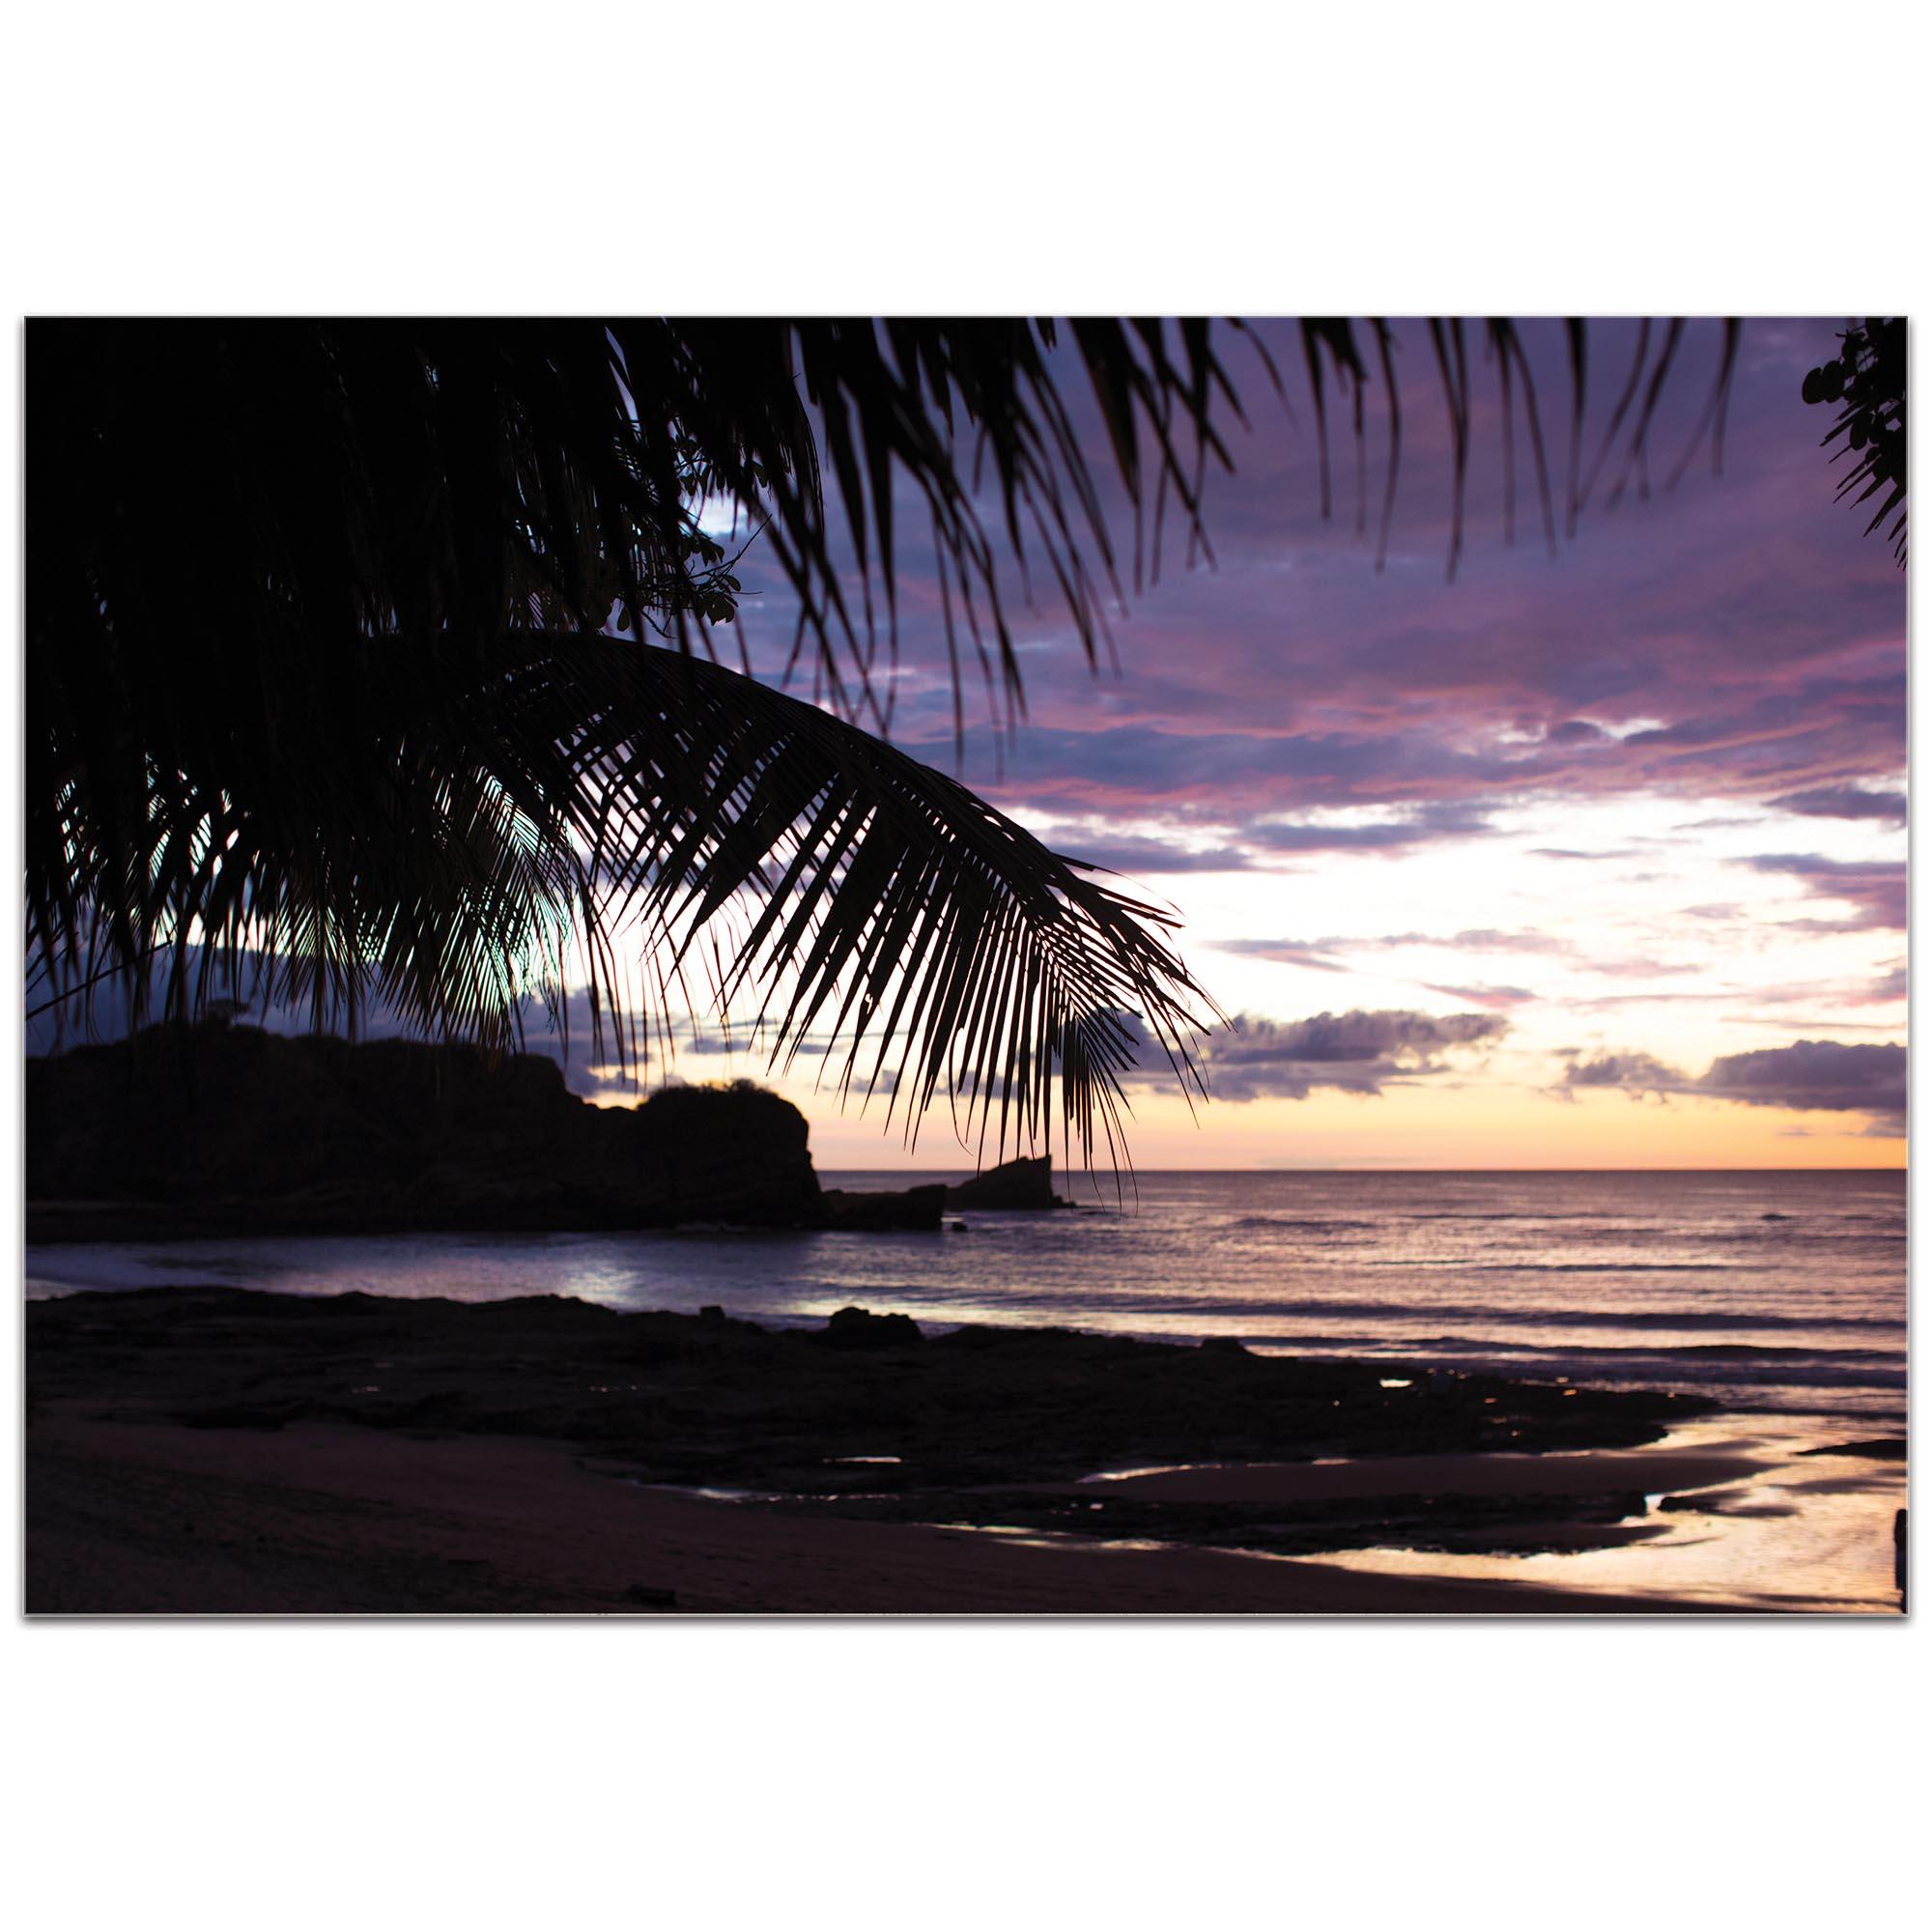 Coastal Wall Art 'Sunset Palms' - Beach Sunset Decor on Metal or Plexiglass - Image 2